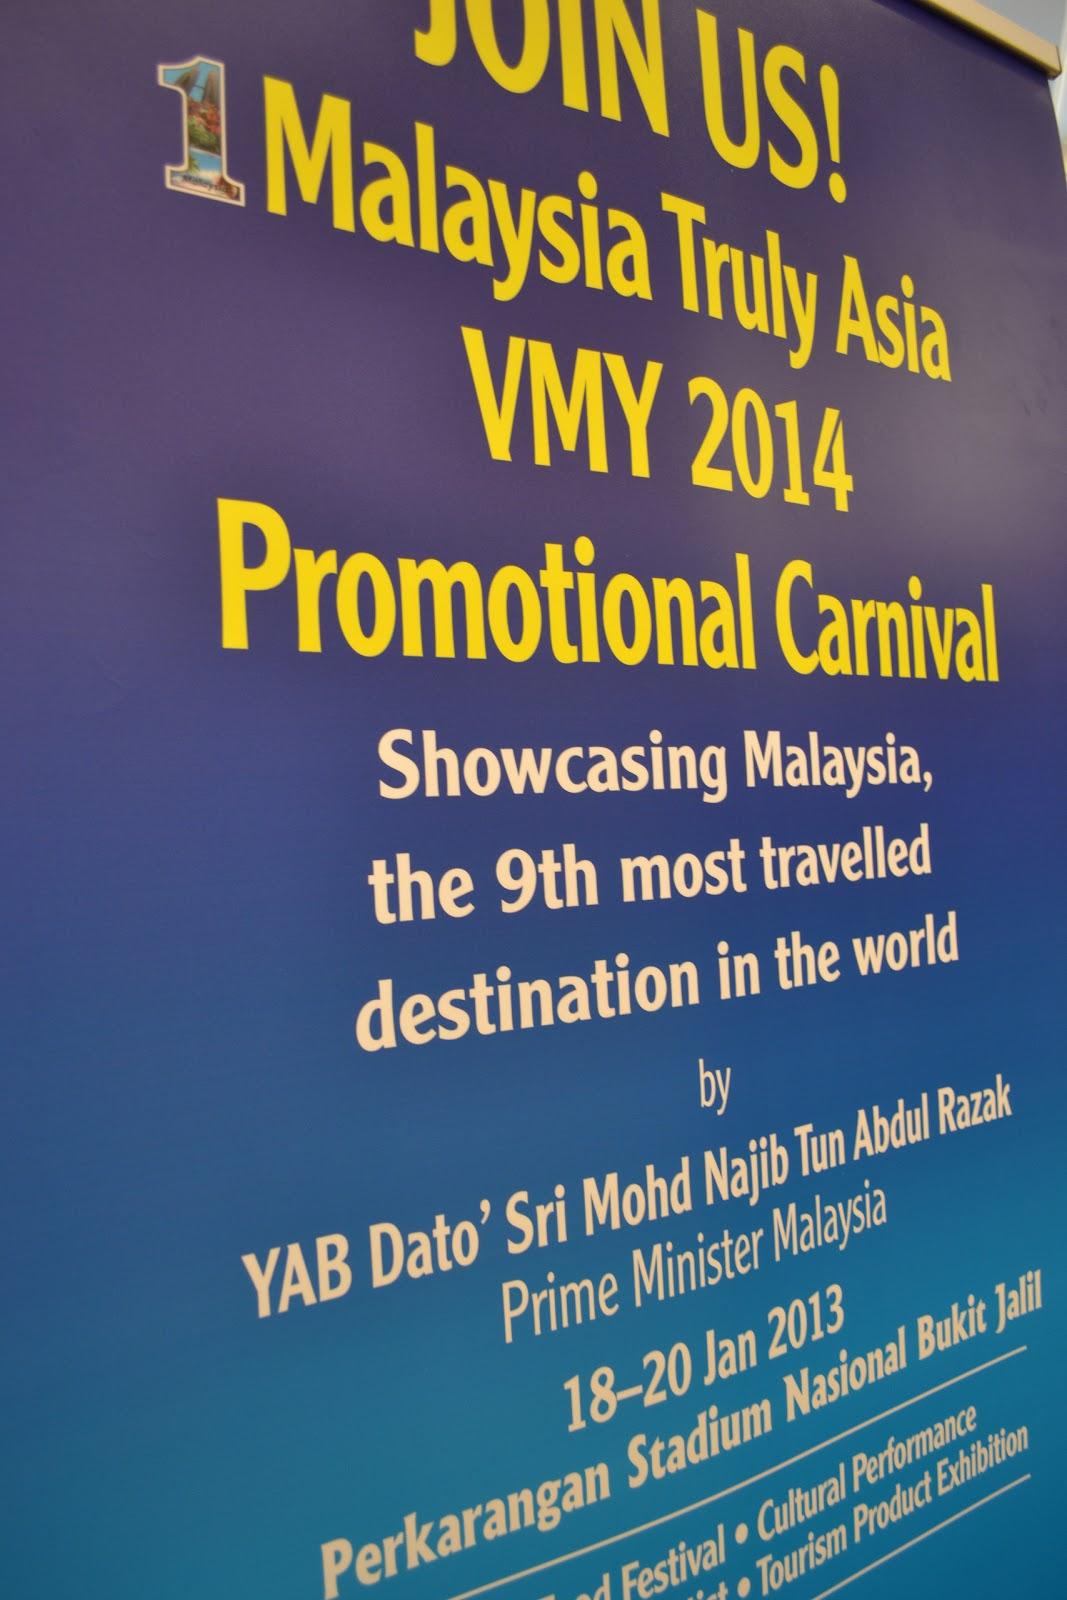 Malaysia School Holidays 2014